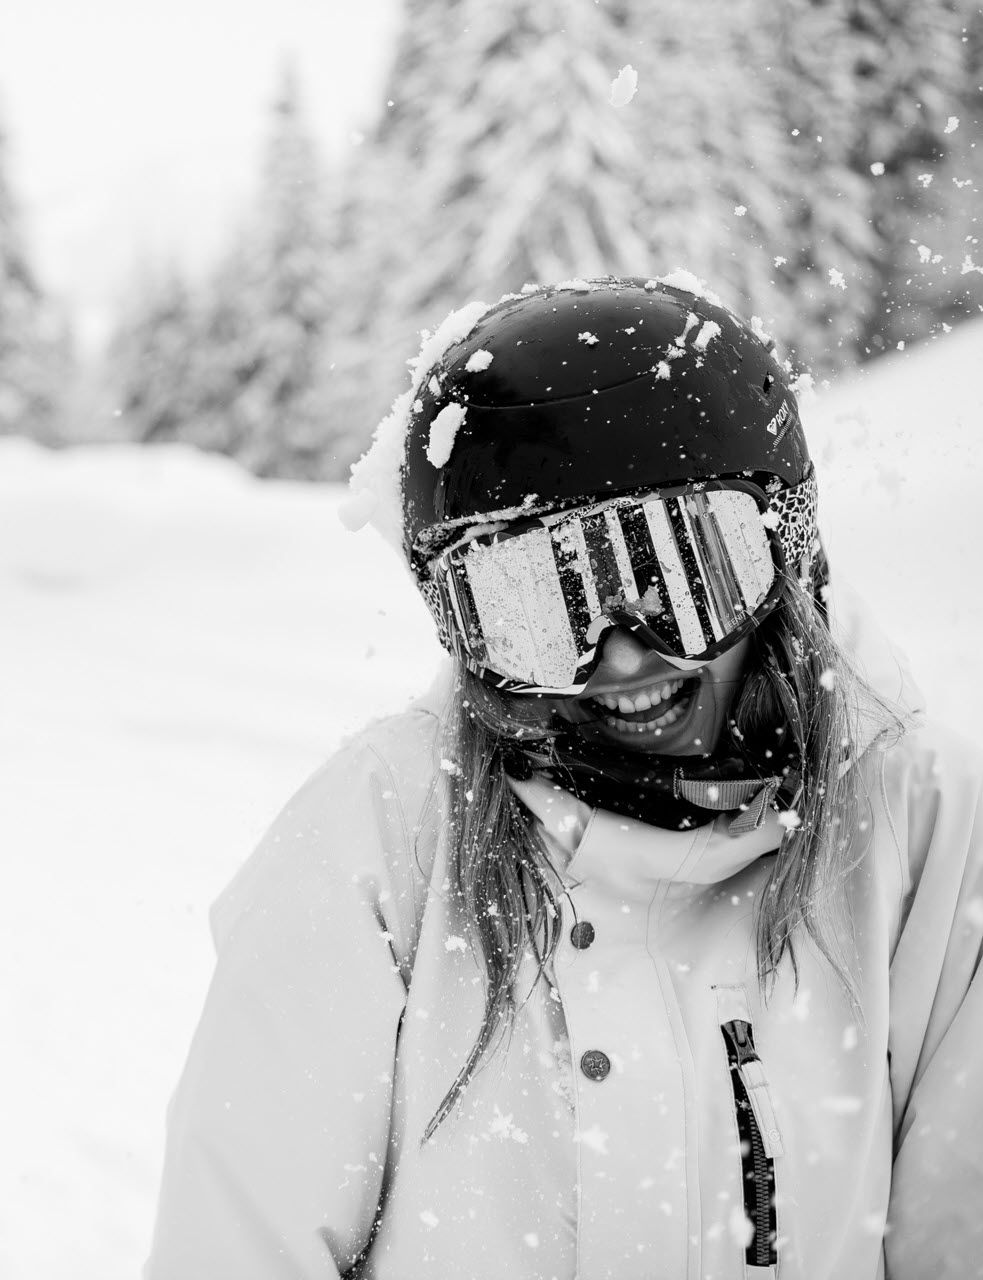 Roxy Snow Wear Snowboarding Blue Tomato Snowboard Outfit Women Blue Tomato Snowboarding Outfit